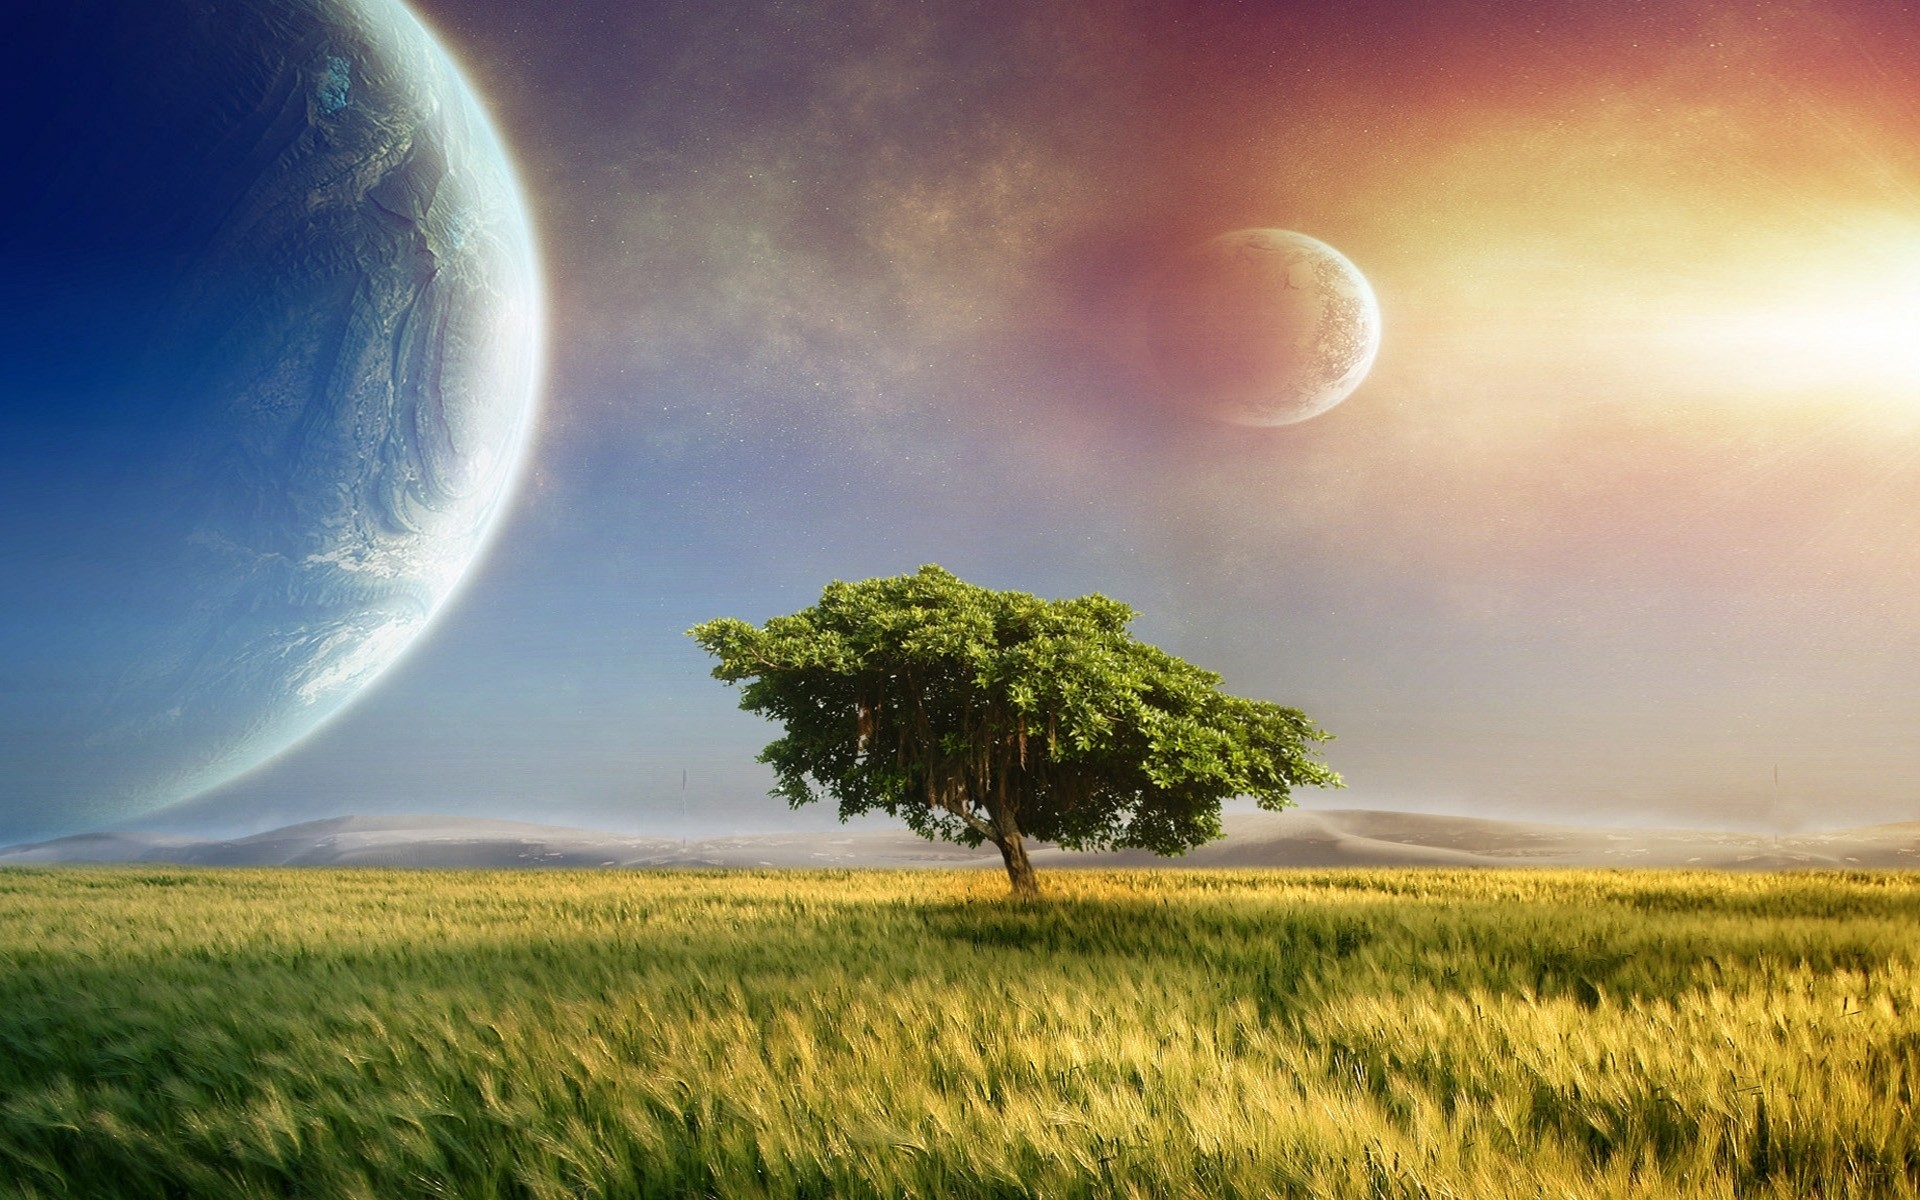 Fantasy art cg digital landscapes fields grass trees sky sunset sunrise sci  fi science planets moons wallpaper     32740   WallpaperUP